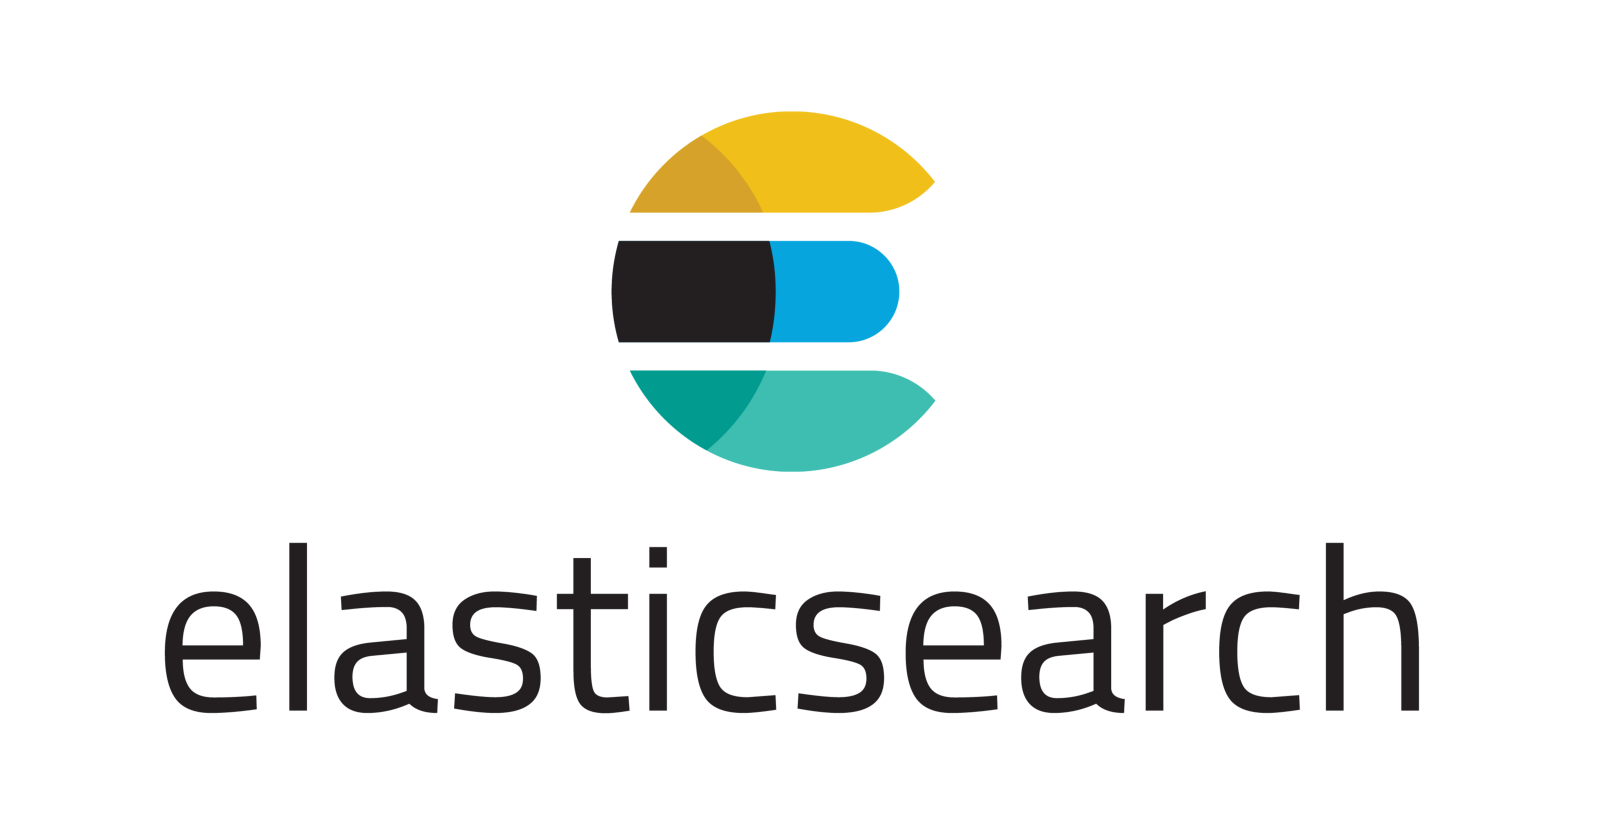 How to configure Elasticsearch  in Centos 7